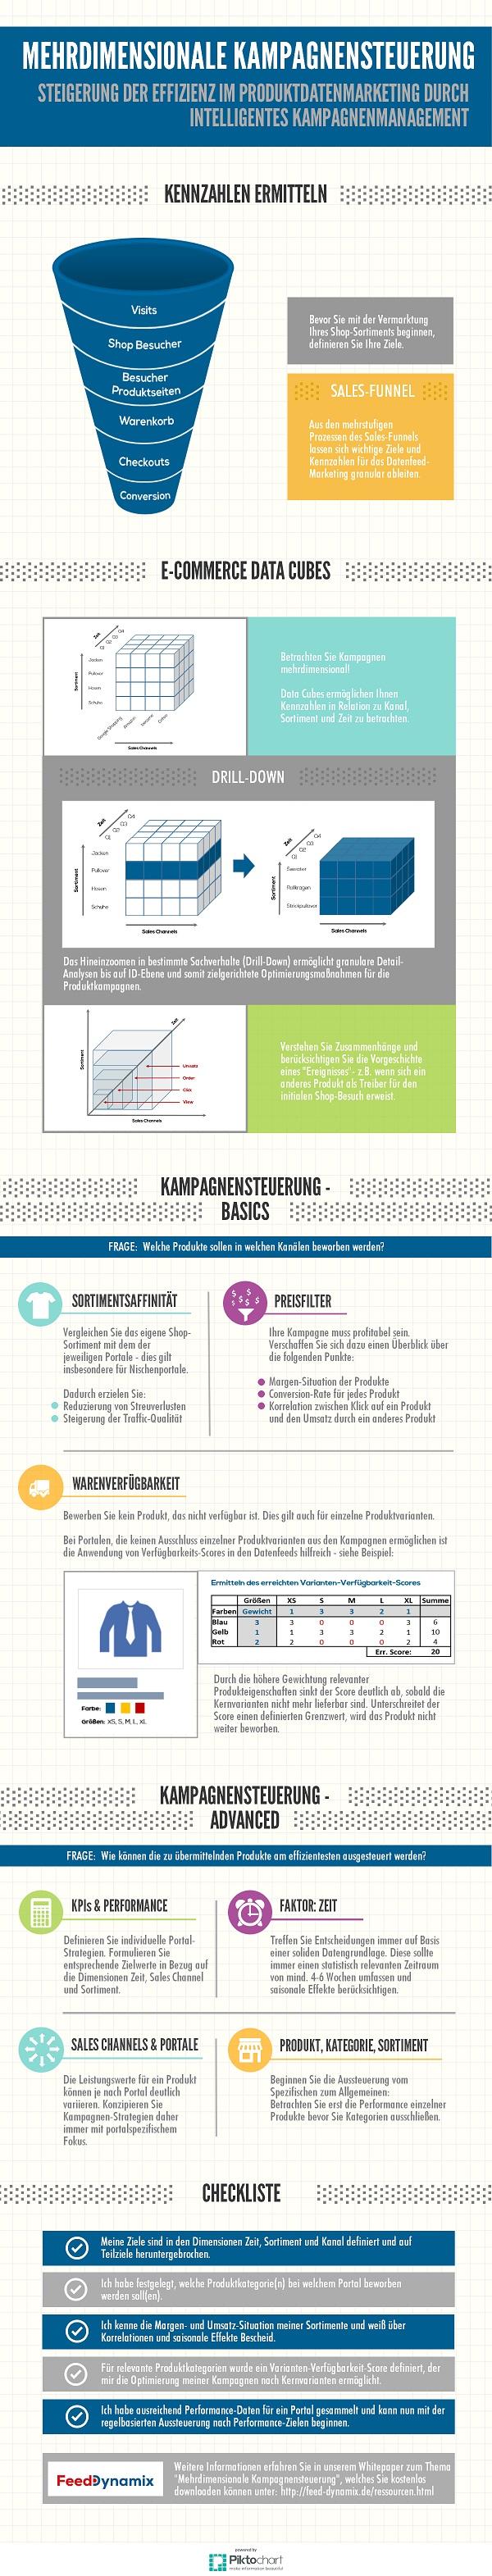 Infografik Mehrdimensionale Kampagnensteuerung